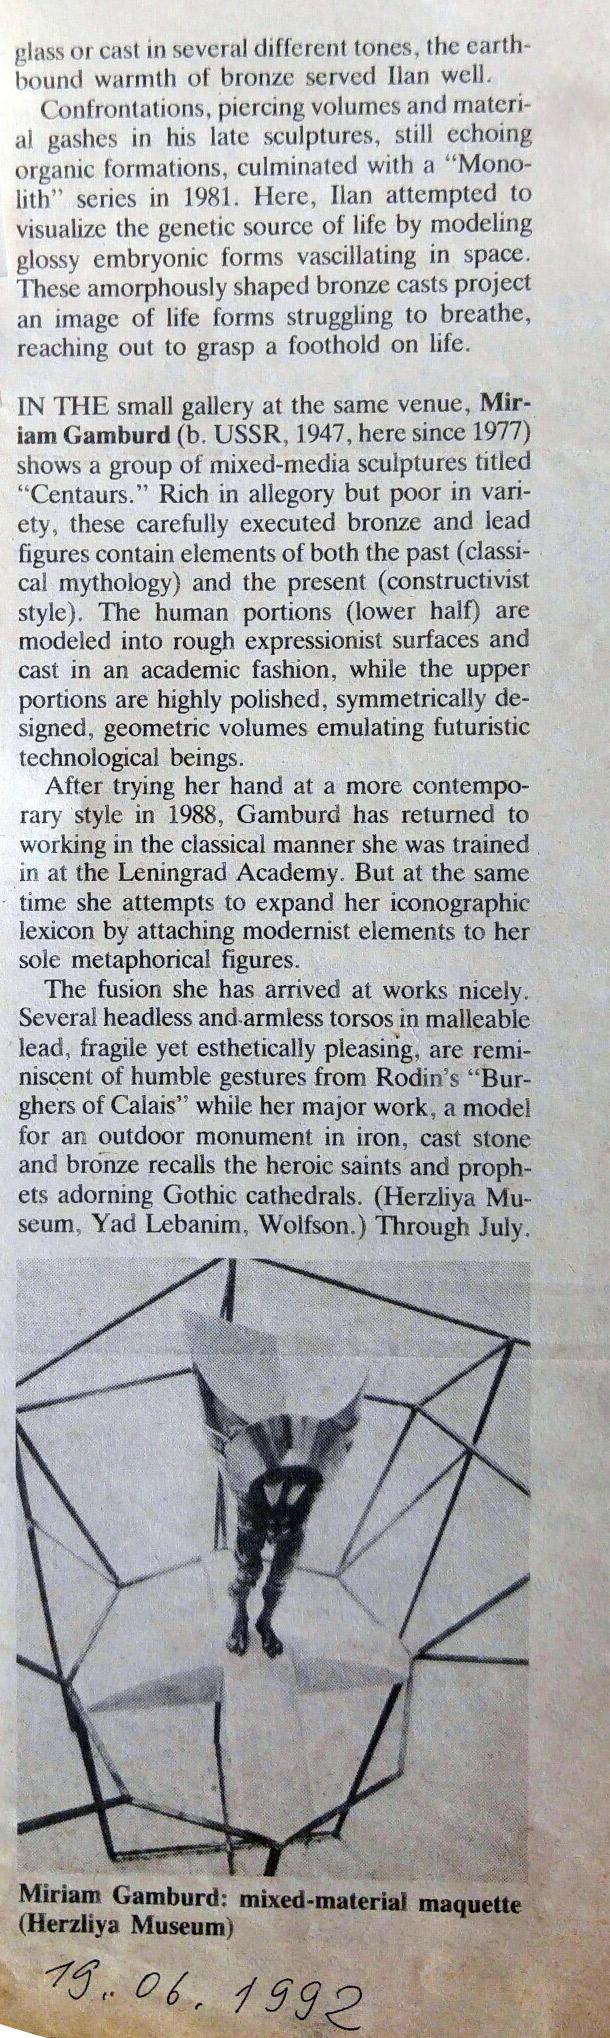 Gil Goldfine. Jerusalem Post 19.06.1992